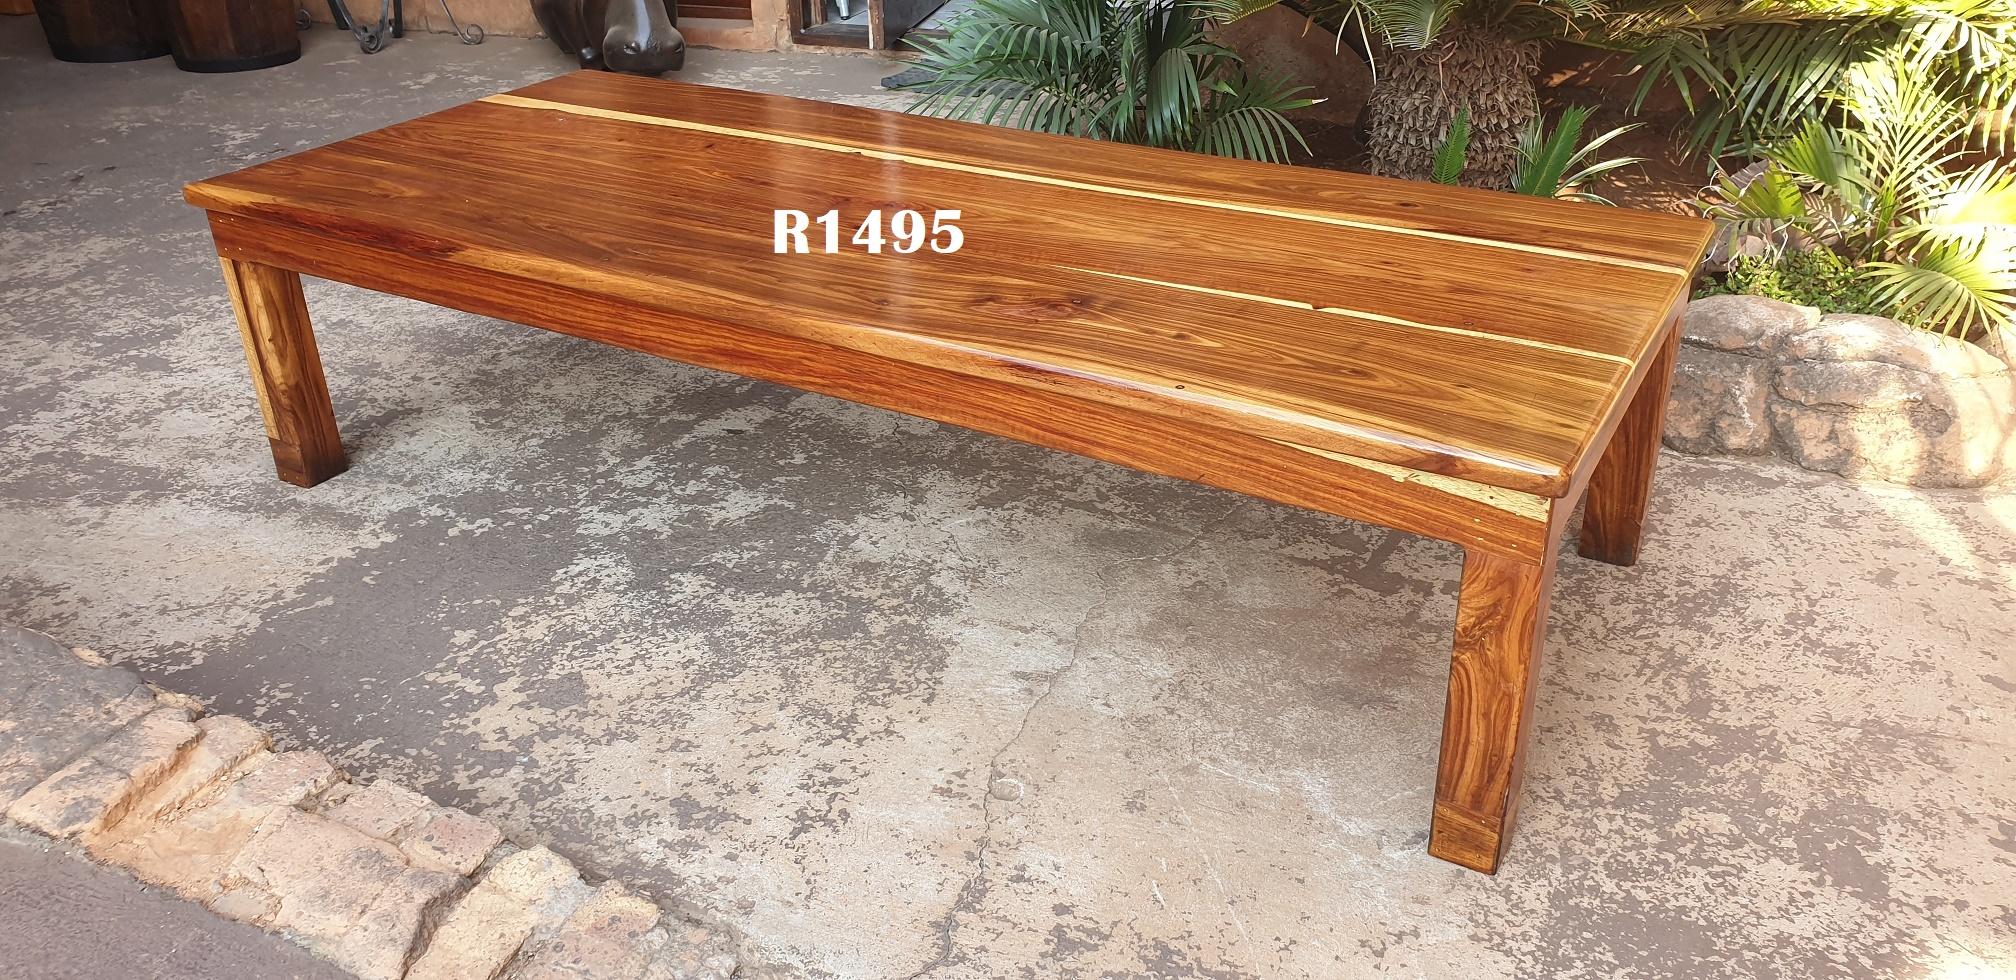 Big Teak Coffee Table (1800x750x445)